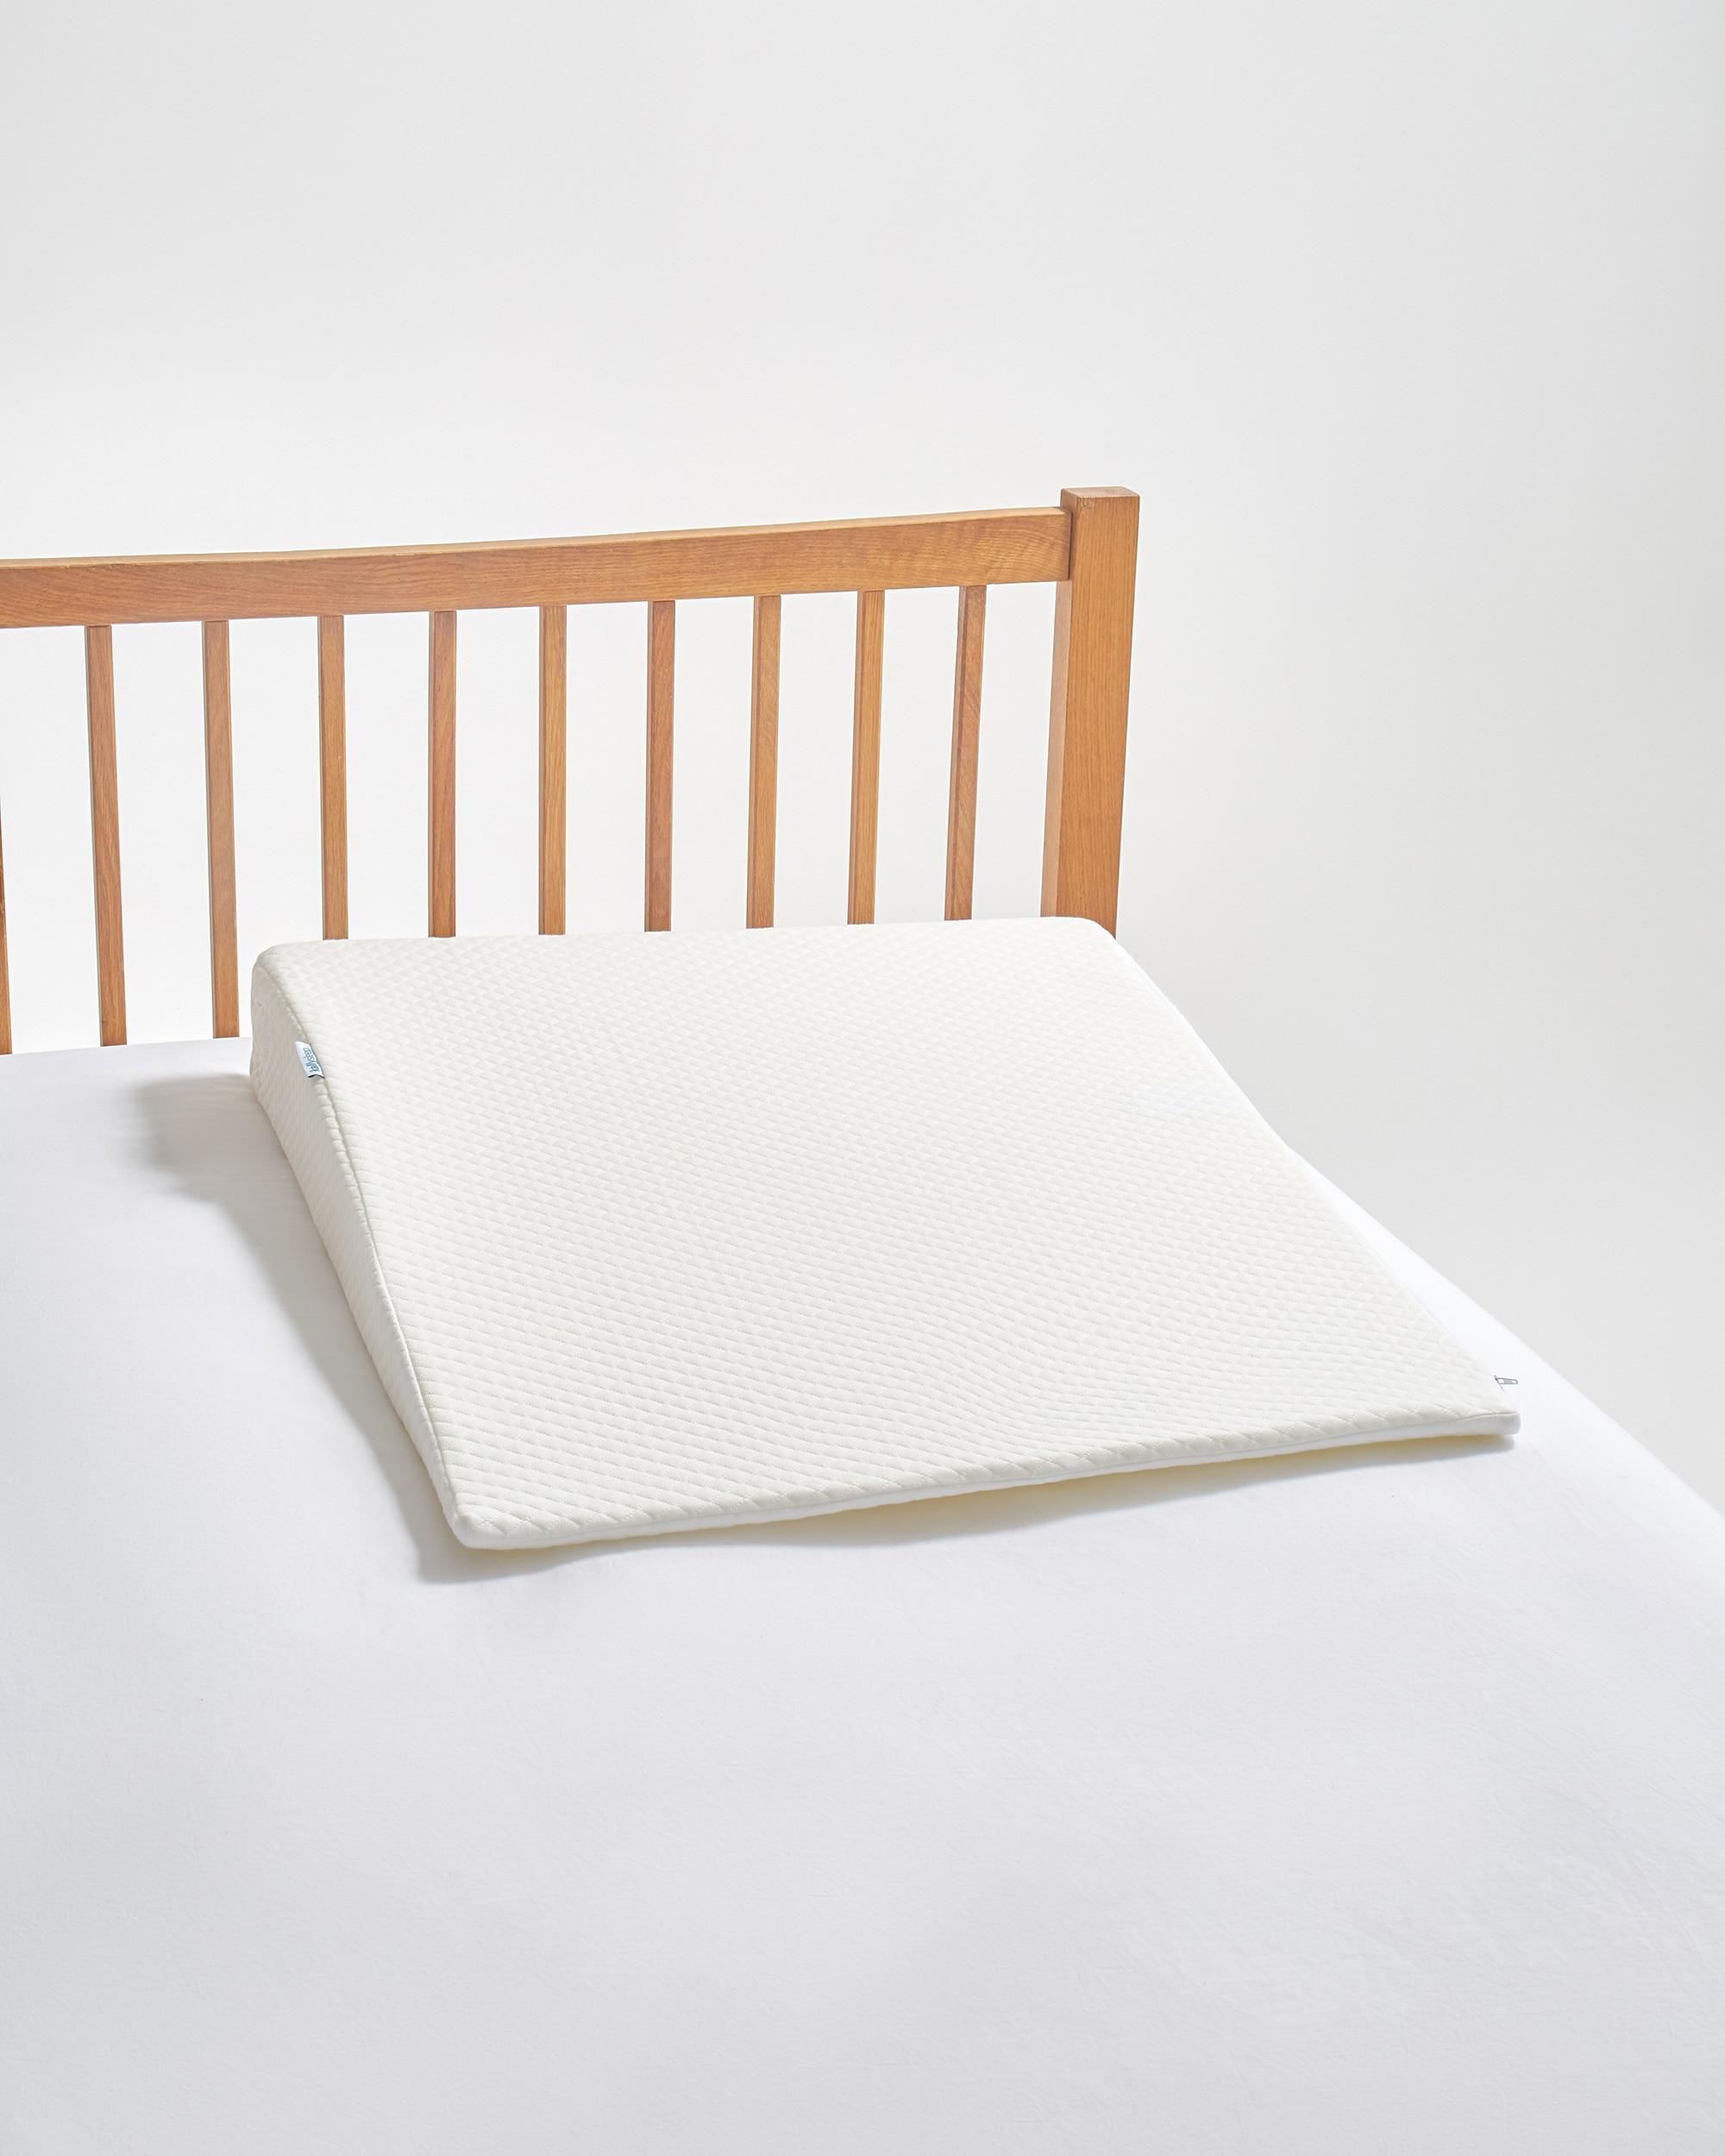 Acid Reflux Wedge Pillow